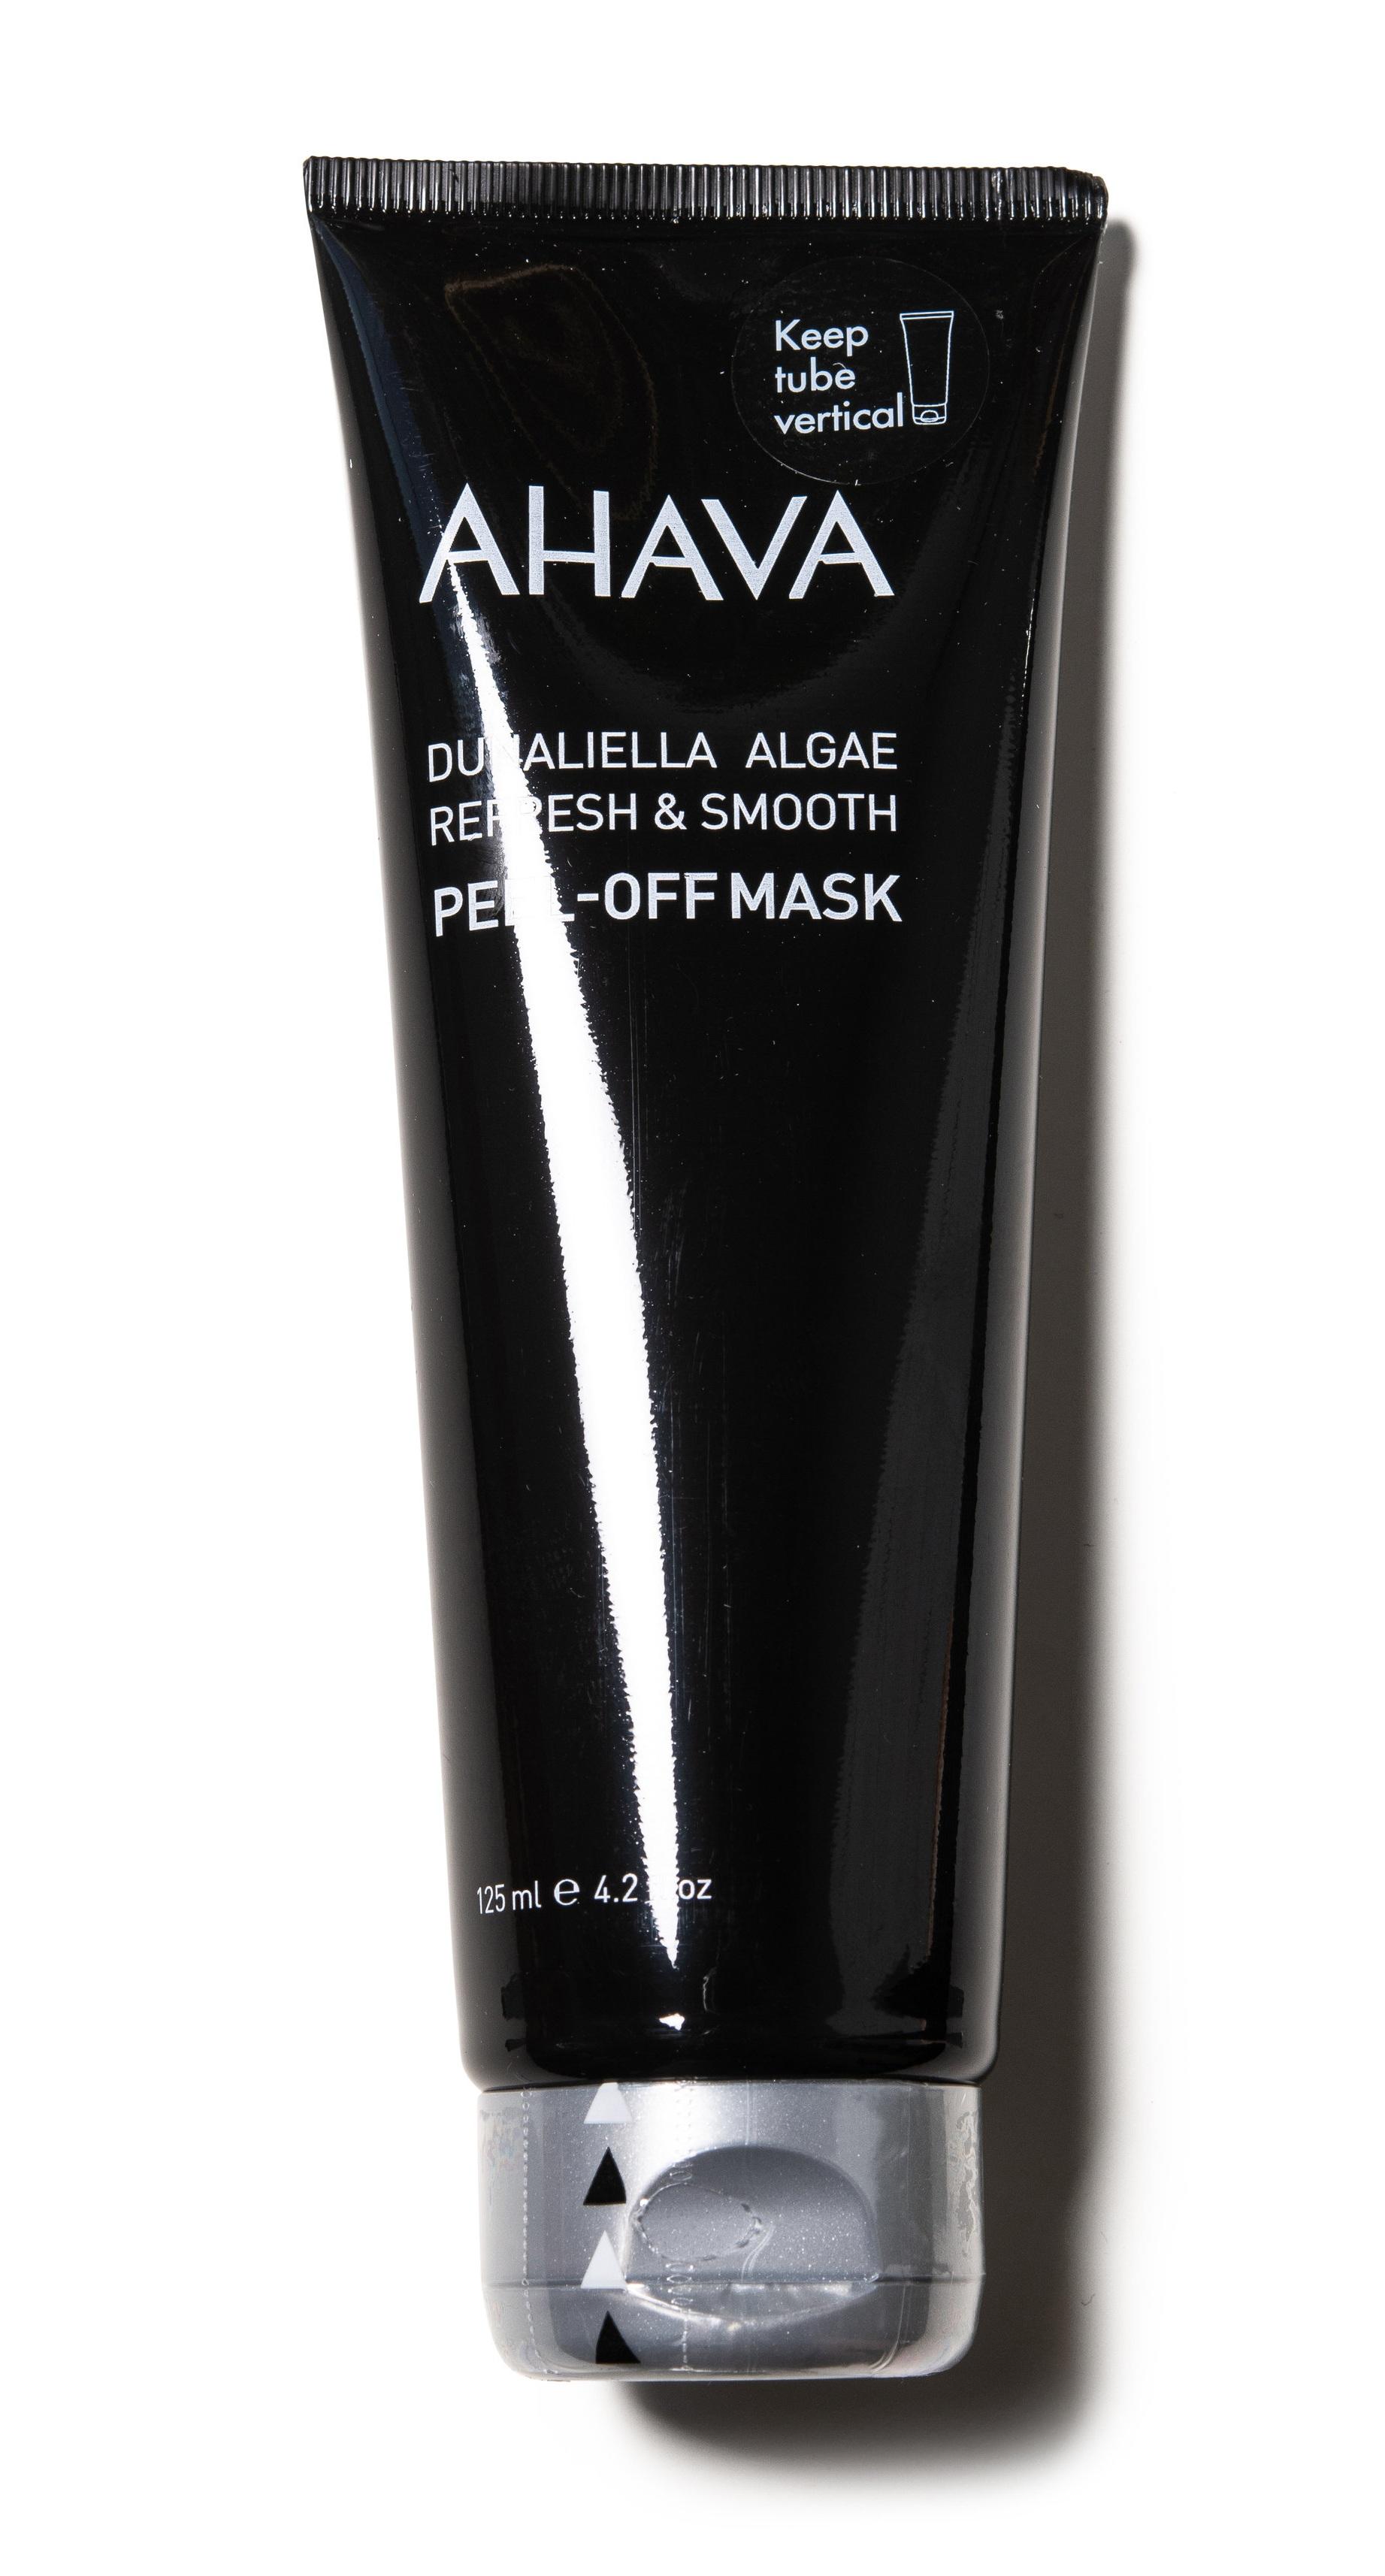 29032017-Masque noir peel off dunaliella_697045155767.jpg